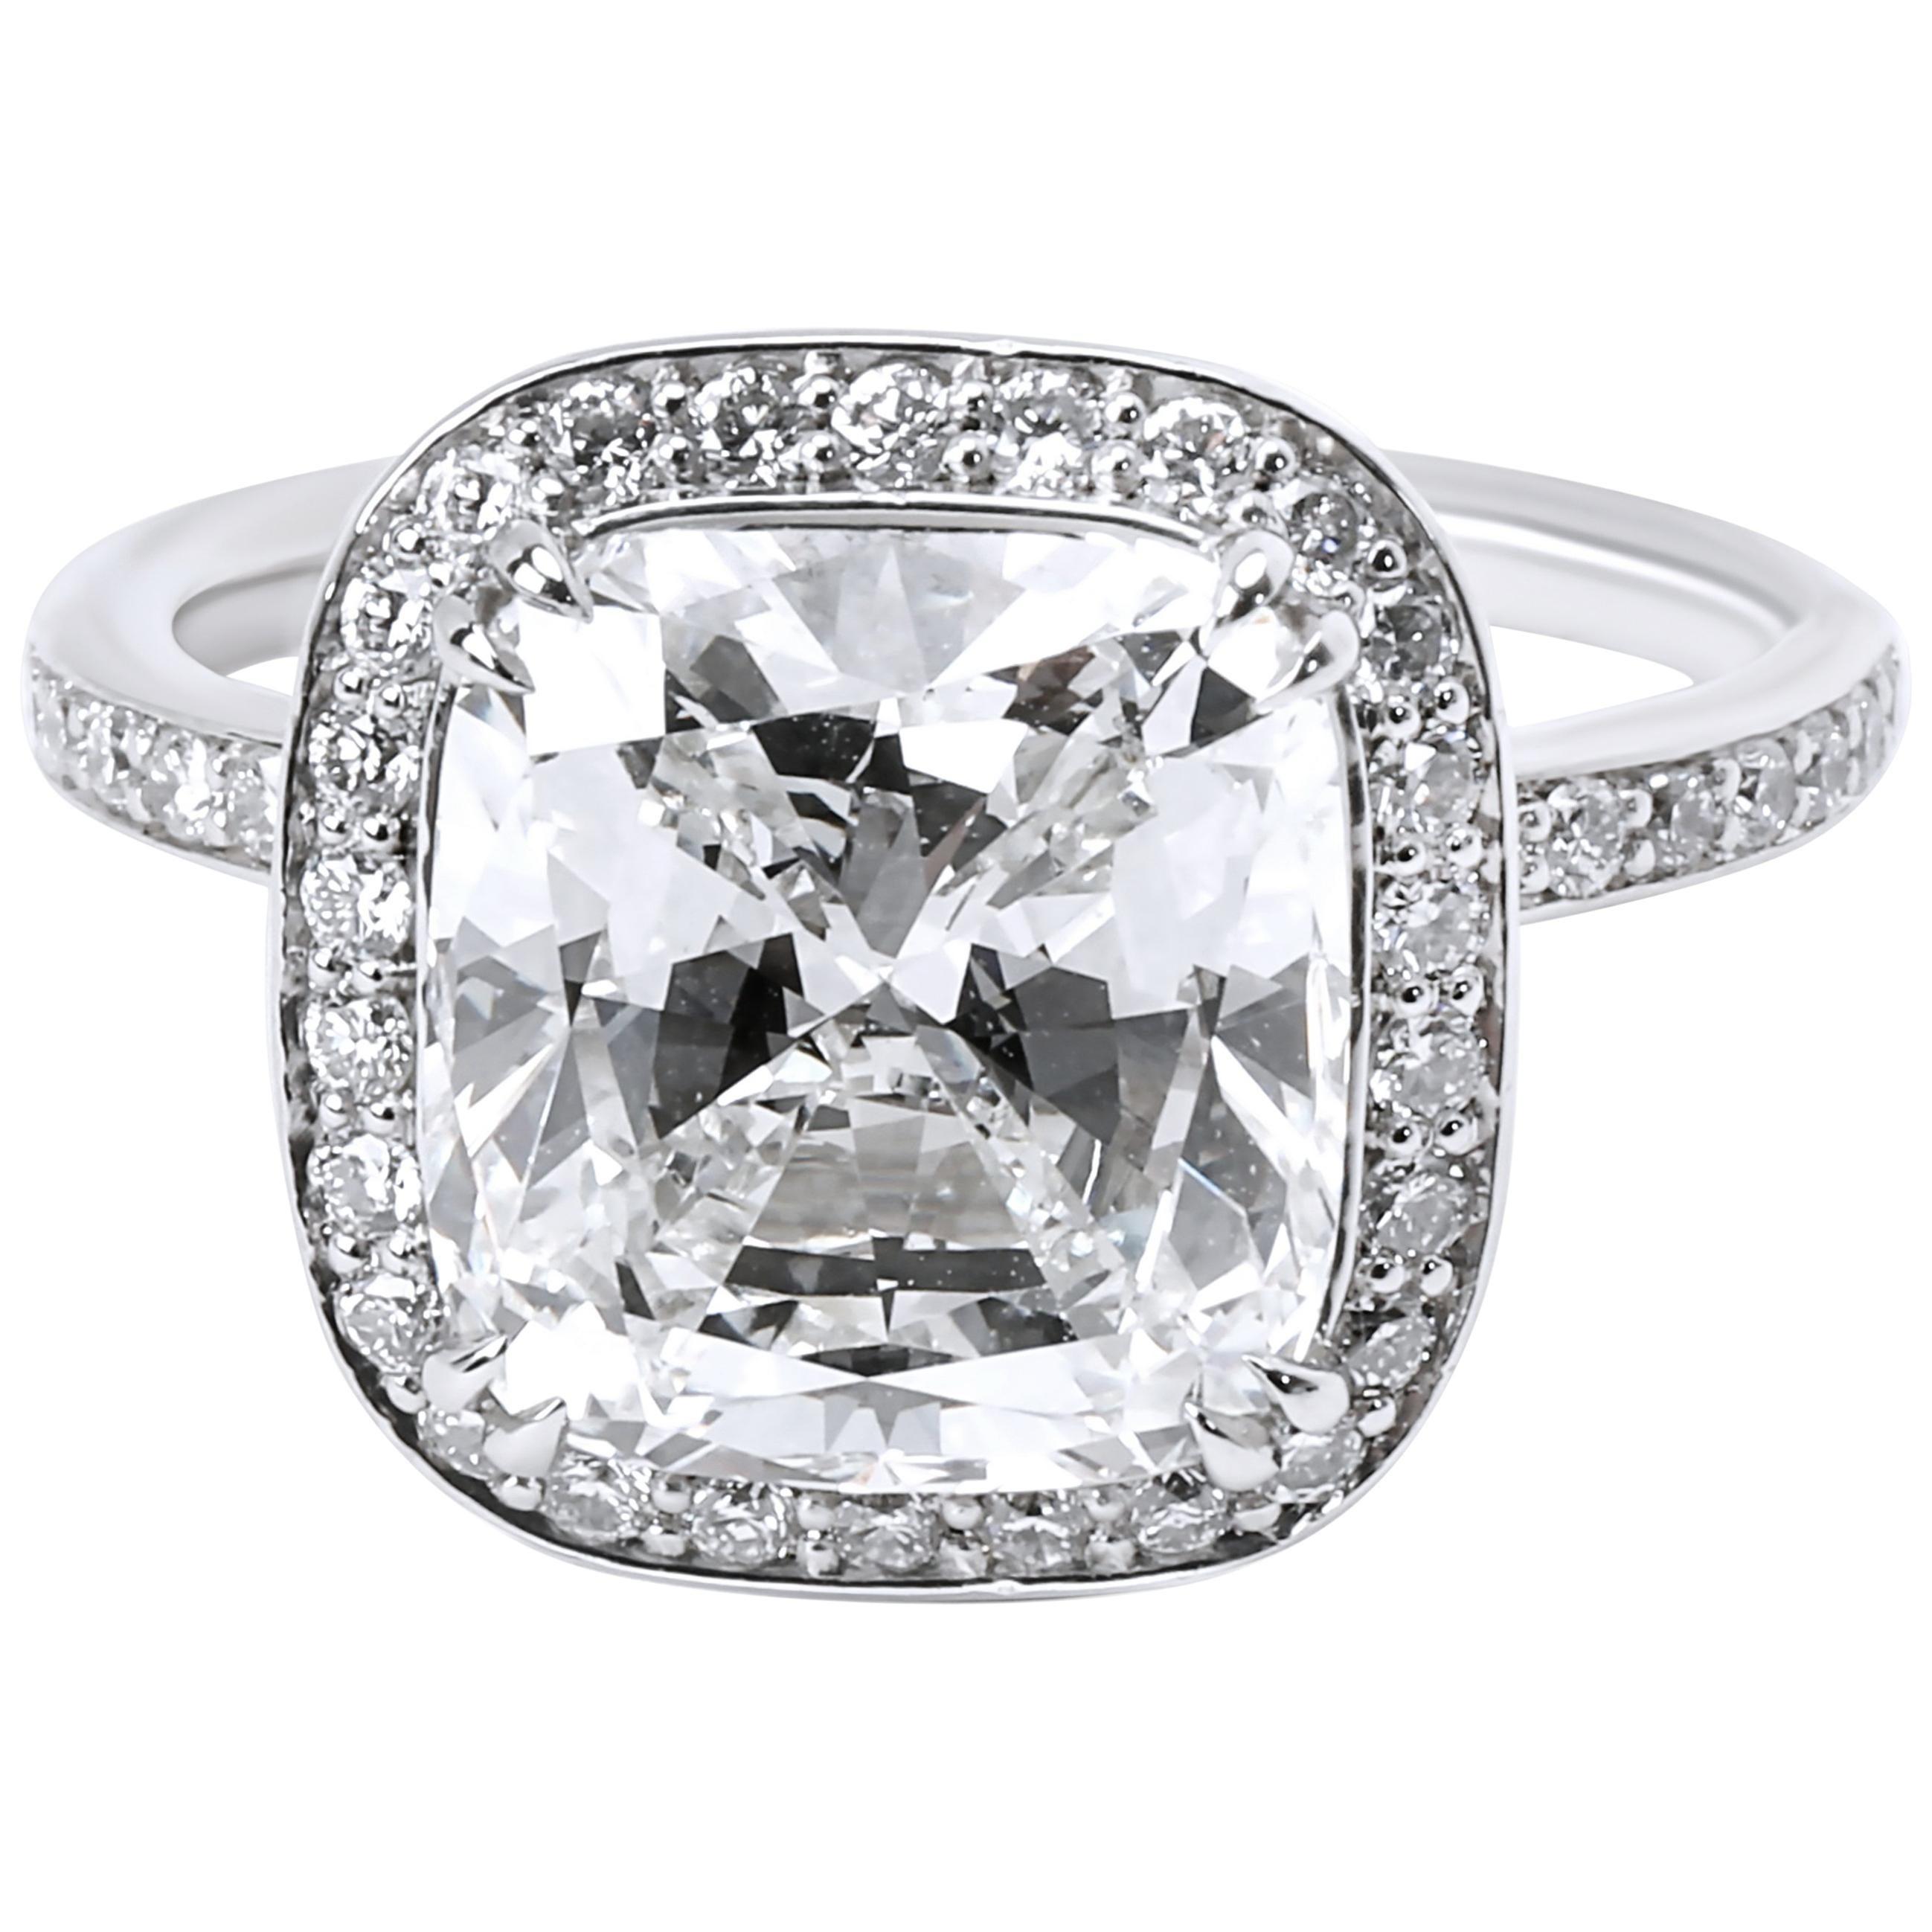 GIA Certified Halo Cushion Diamond Engagement Ring in Platinum G VS1 4.48 Carat